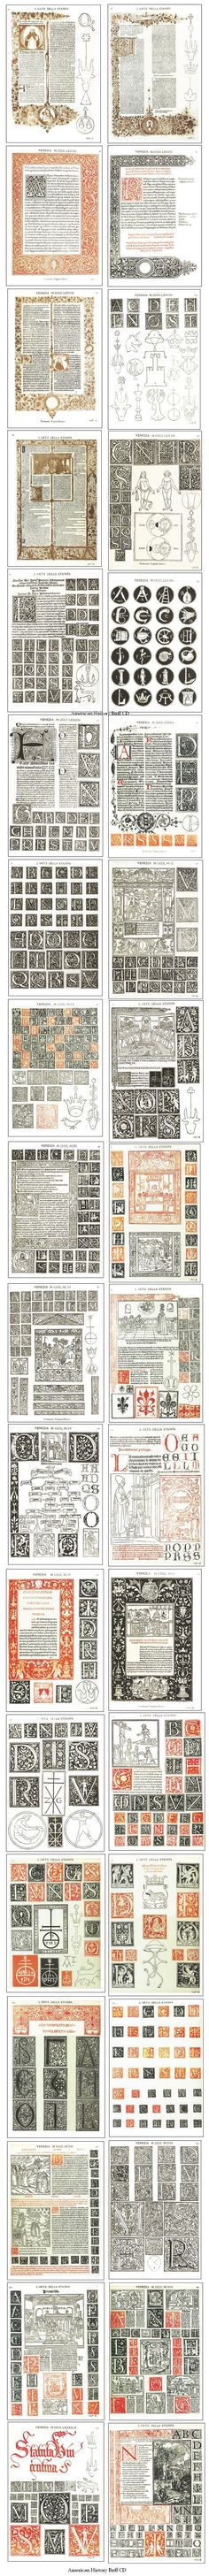 Venetian Typography Italian Renaissance Woodcut Printing Illuminated Manuscript | eBay: